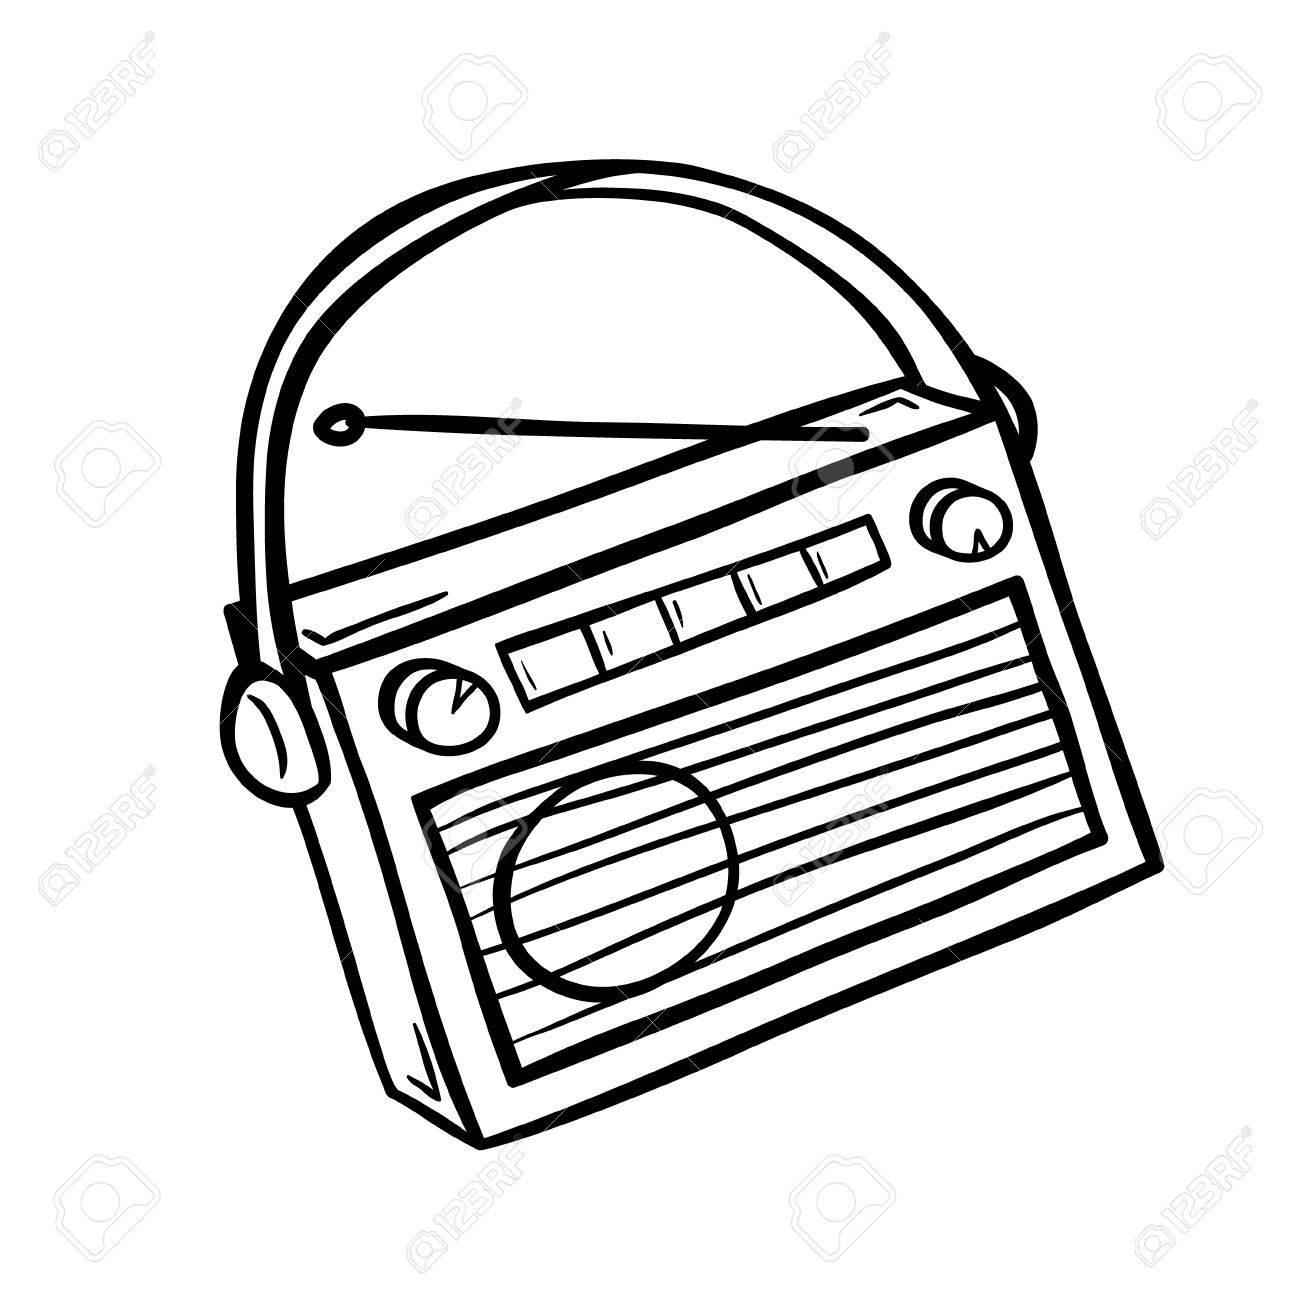 1300x1300 Retro Radio In Doodle Style. Hand Drawn Vector Illustration